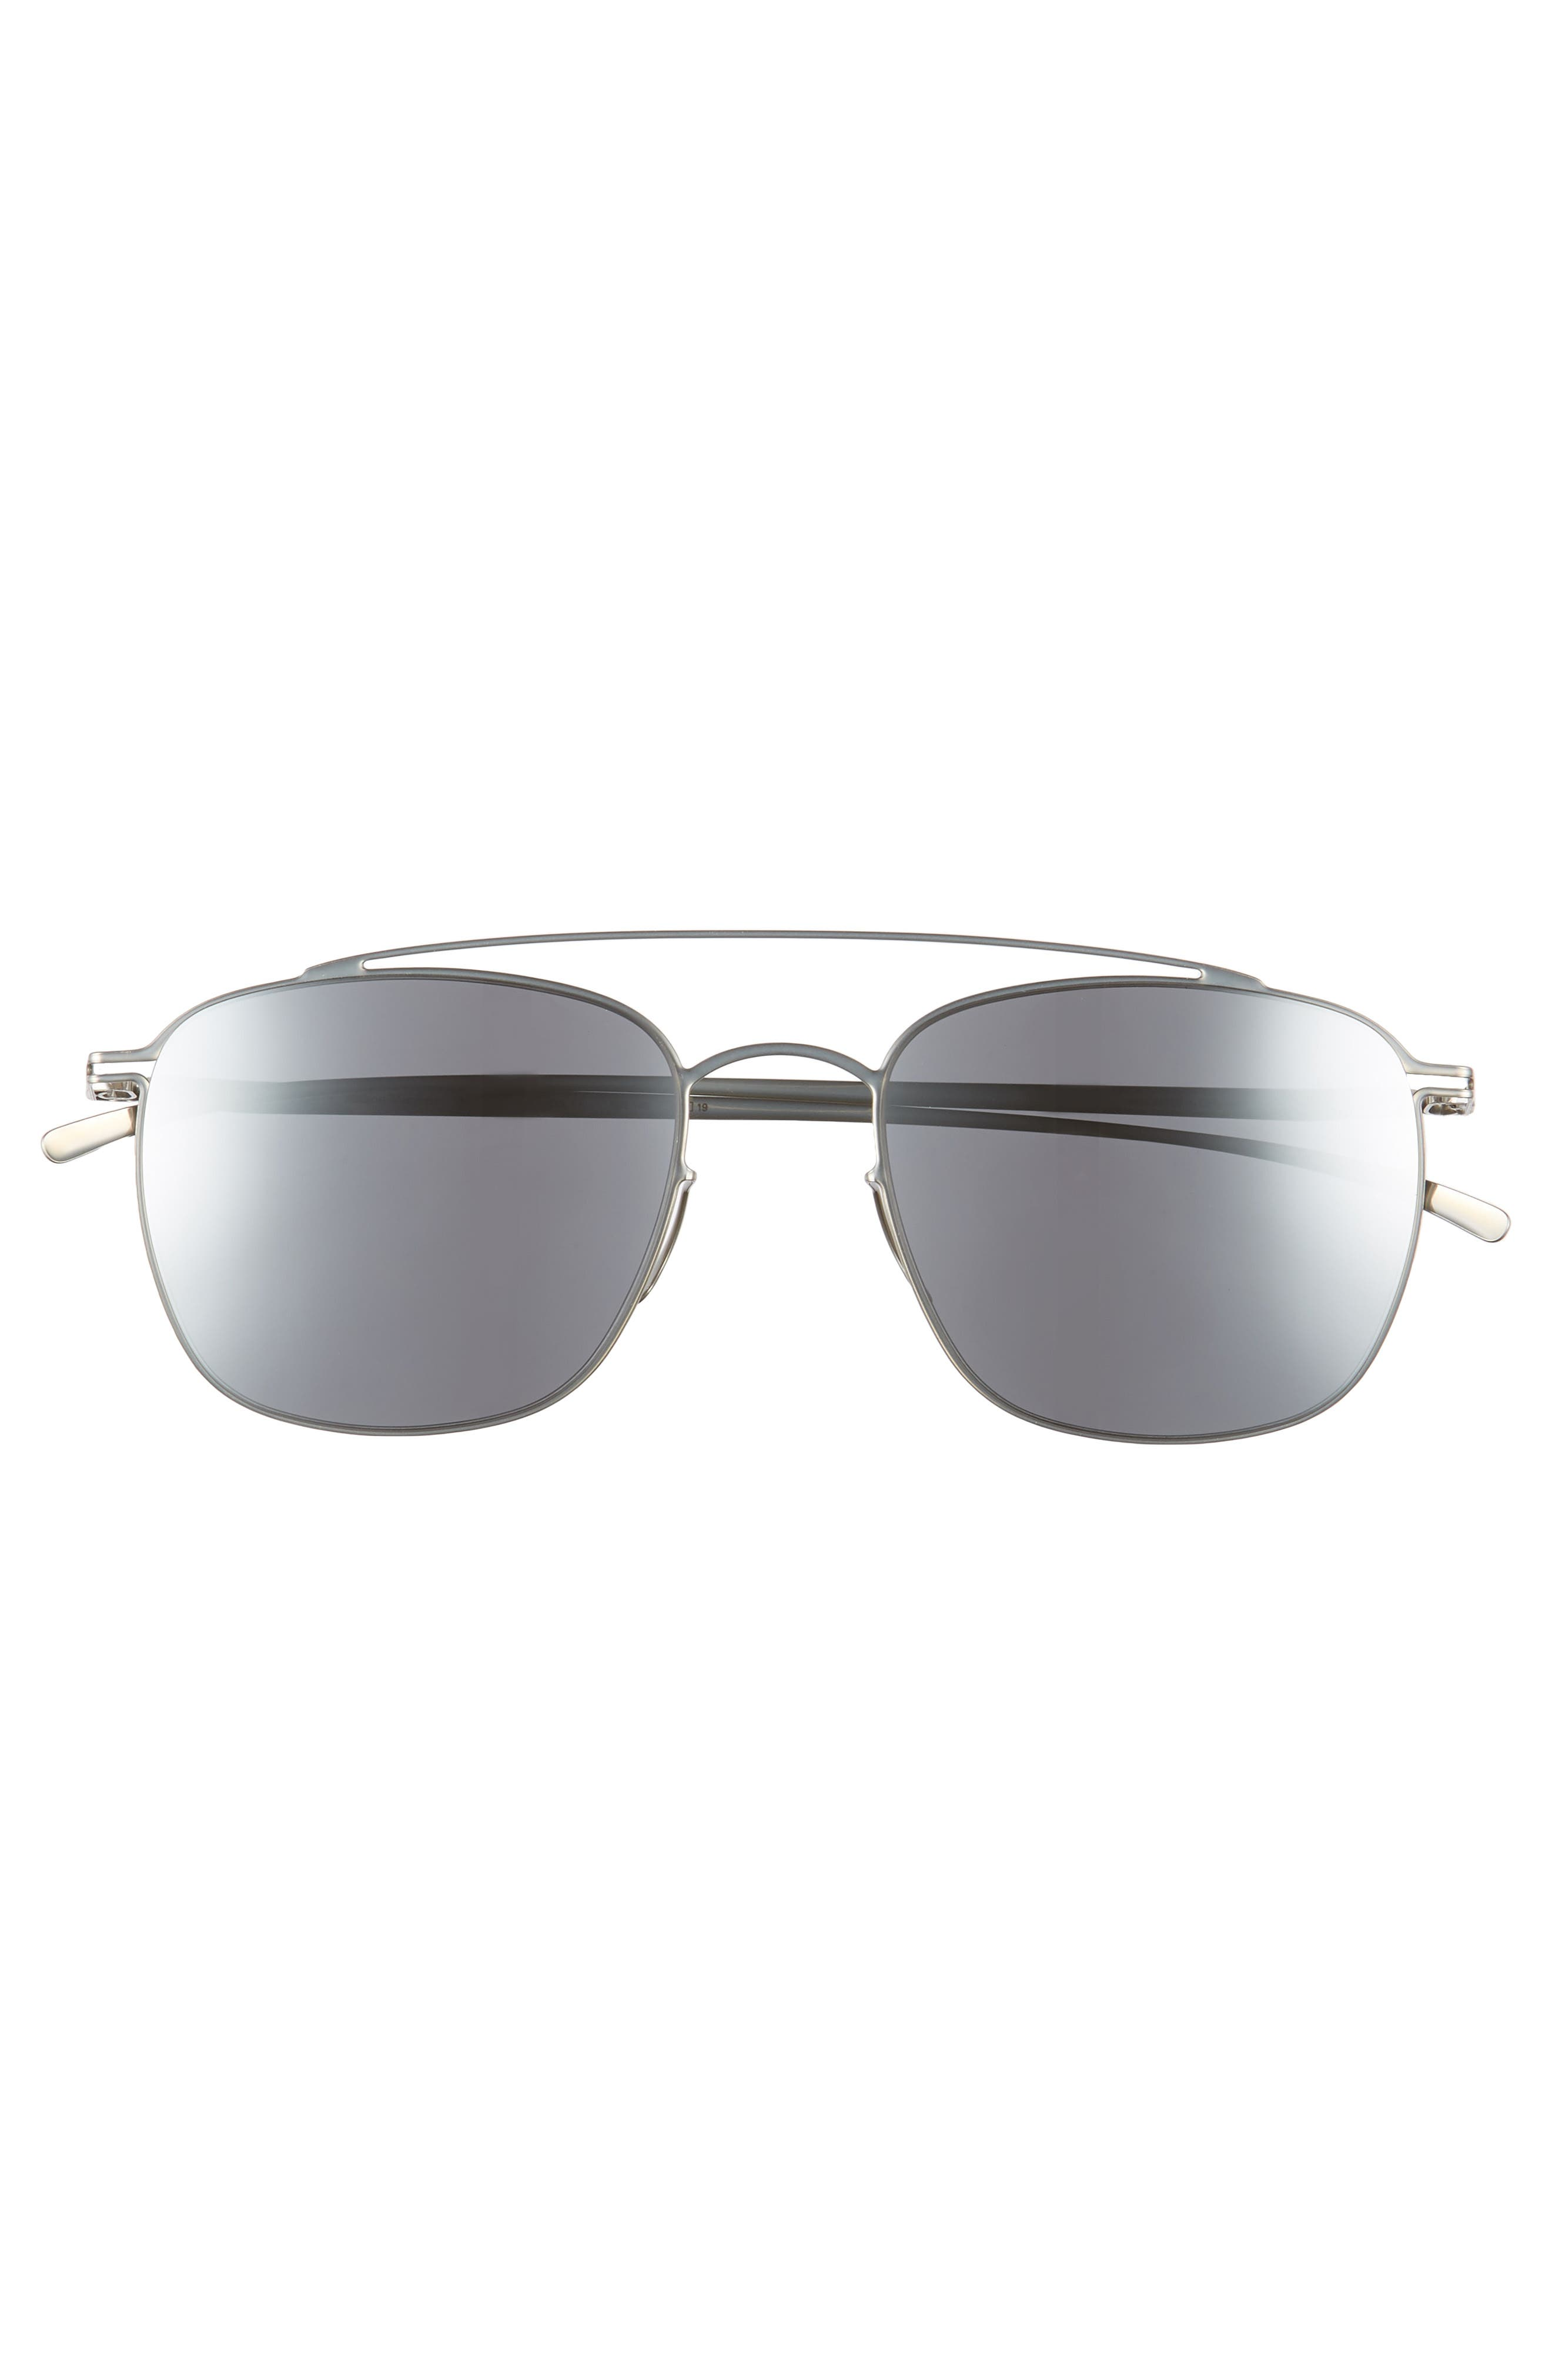 MMESSE007 51mm Aviator Sunglasses,                             Alternate thumbnail 5, color,